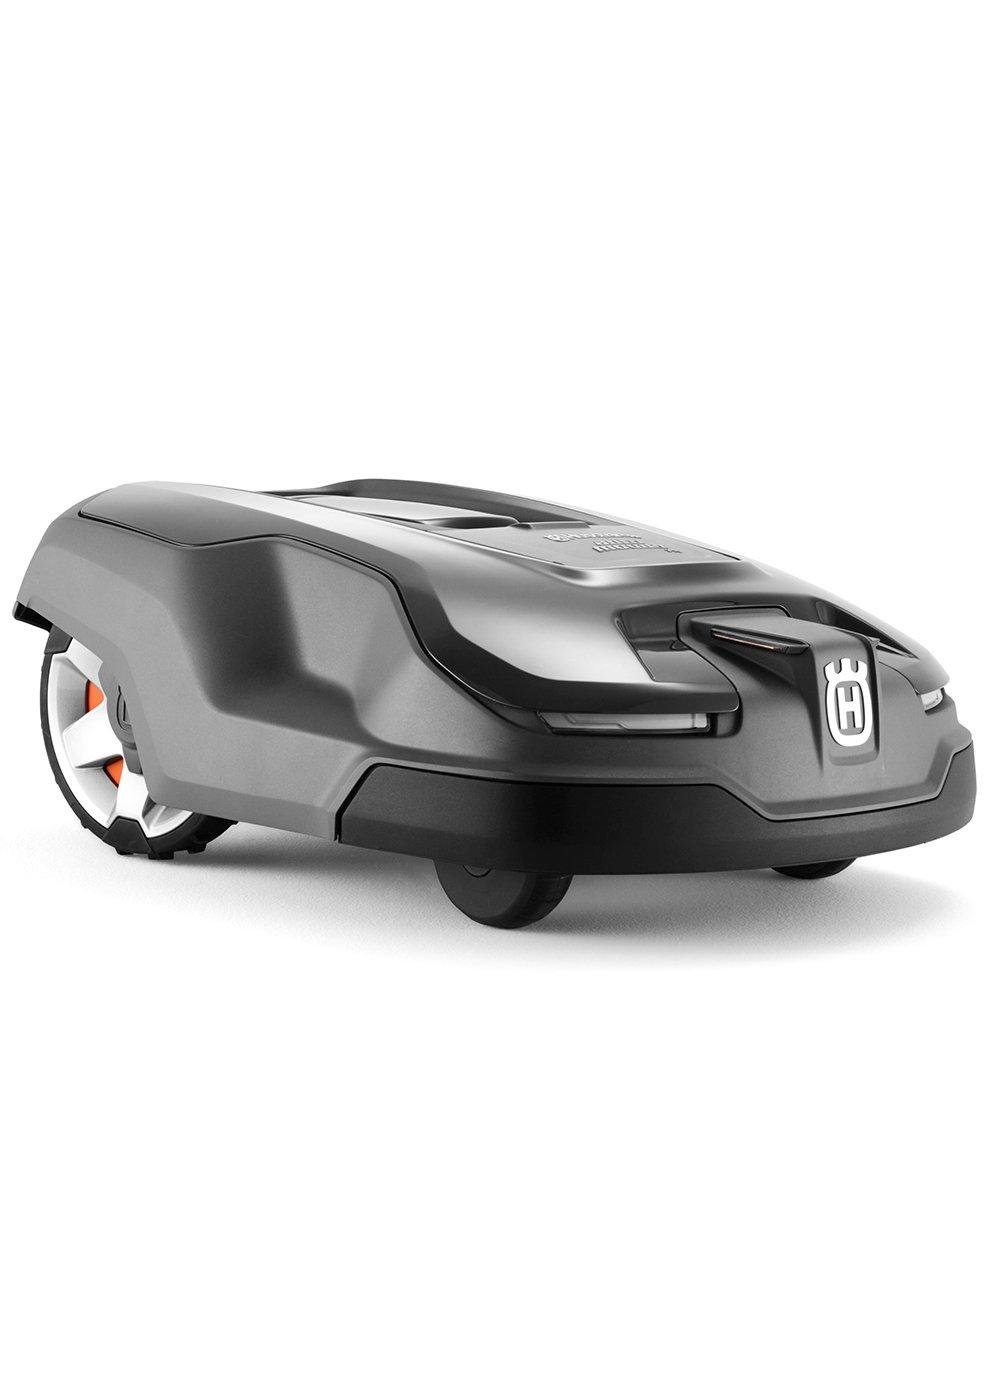 Husqvarna Automower 315X - Robot Cortacésped - Un modelo ...